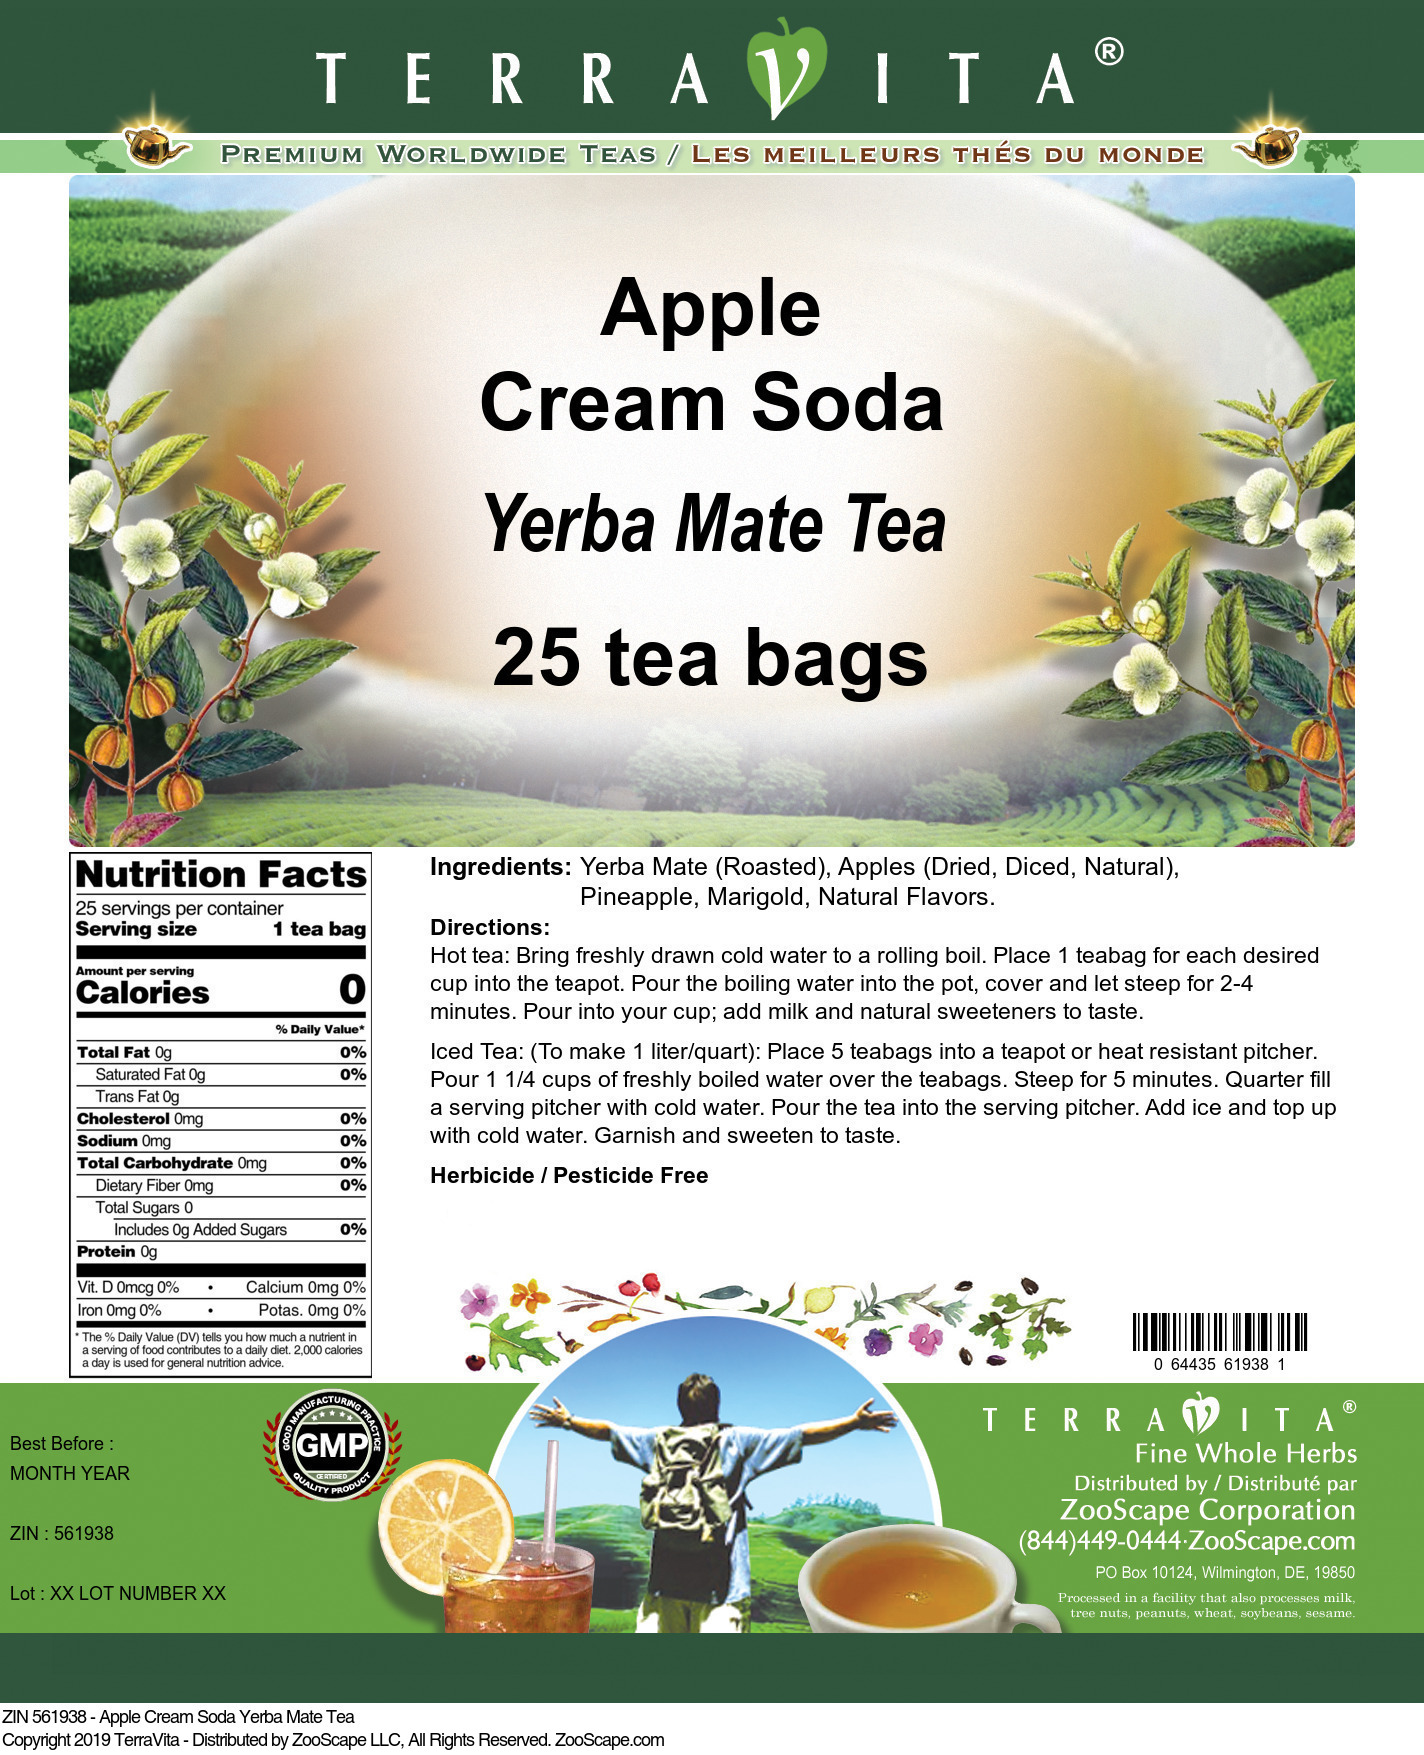 Apple Cream Soda Yerba Mate